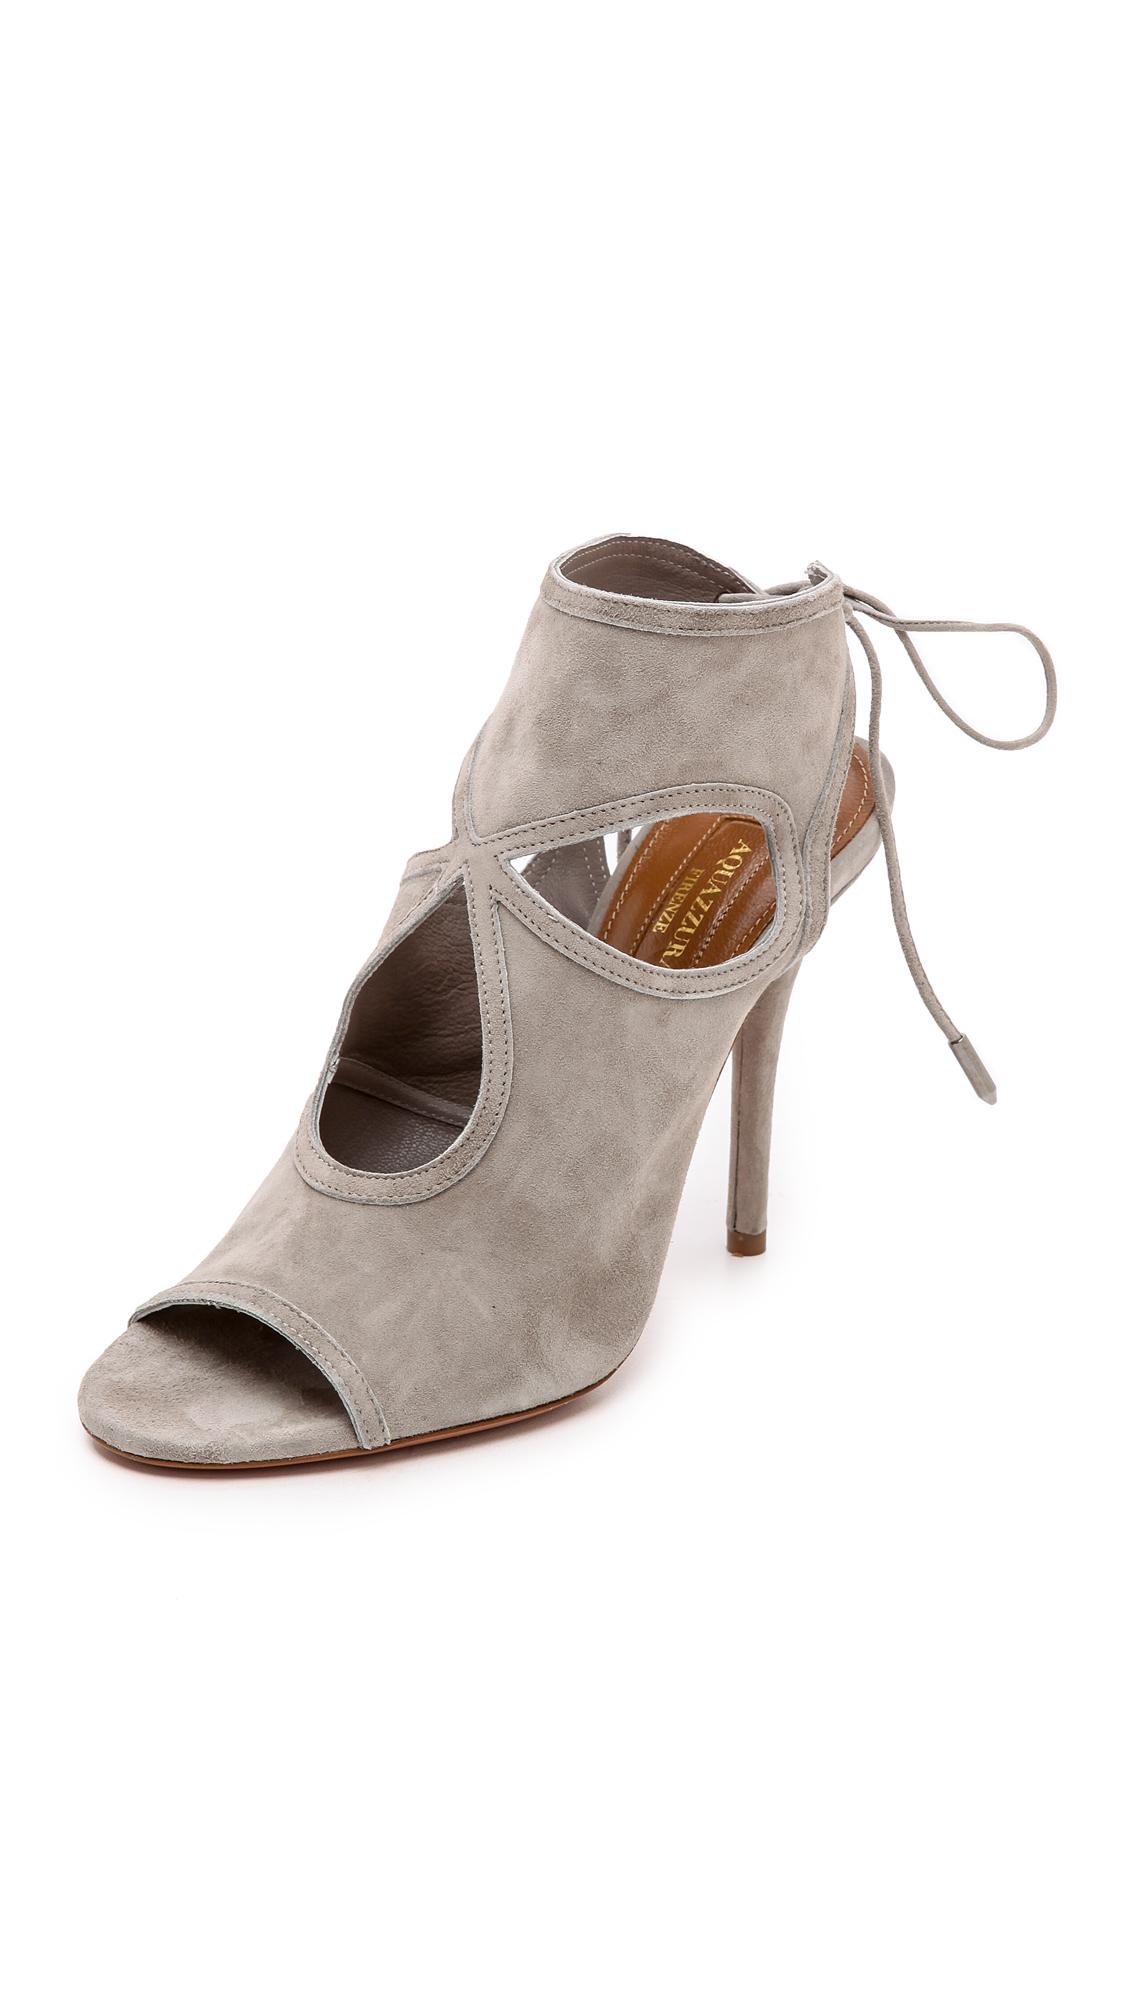 Aquazzura Sexy Thing Suede 85Mm Sandal, Light Gray In Light Grey